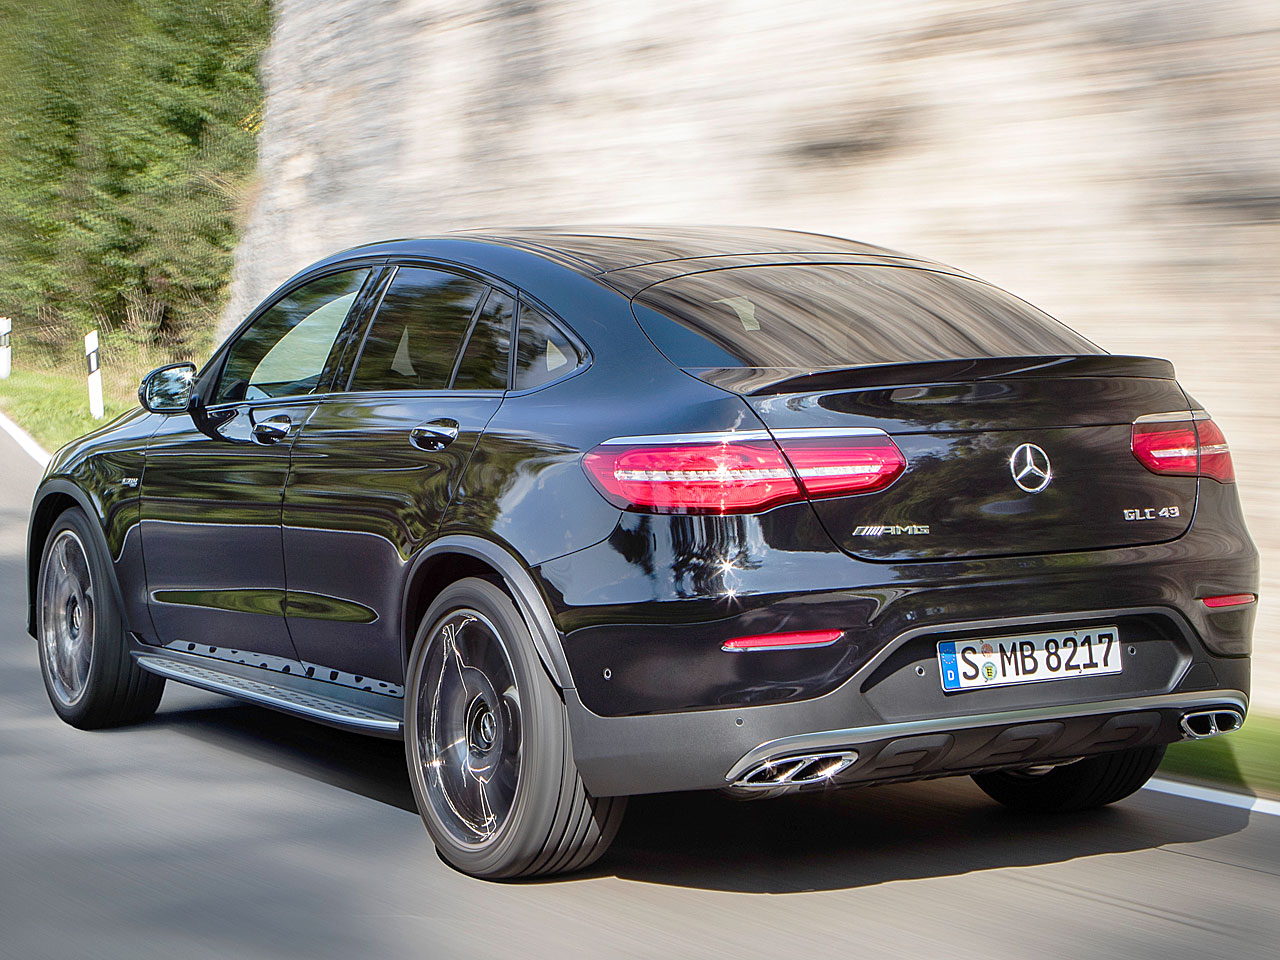 Mercedes Amg Glc 43 Coupé 2016 Preis Autozeitungde